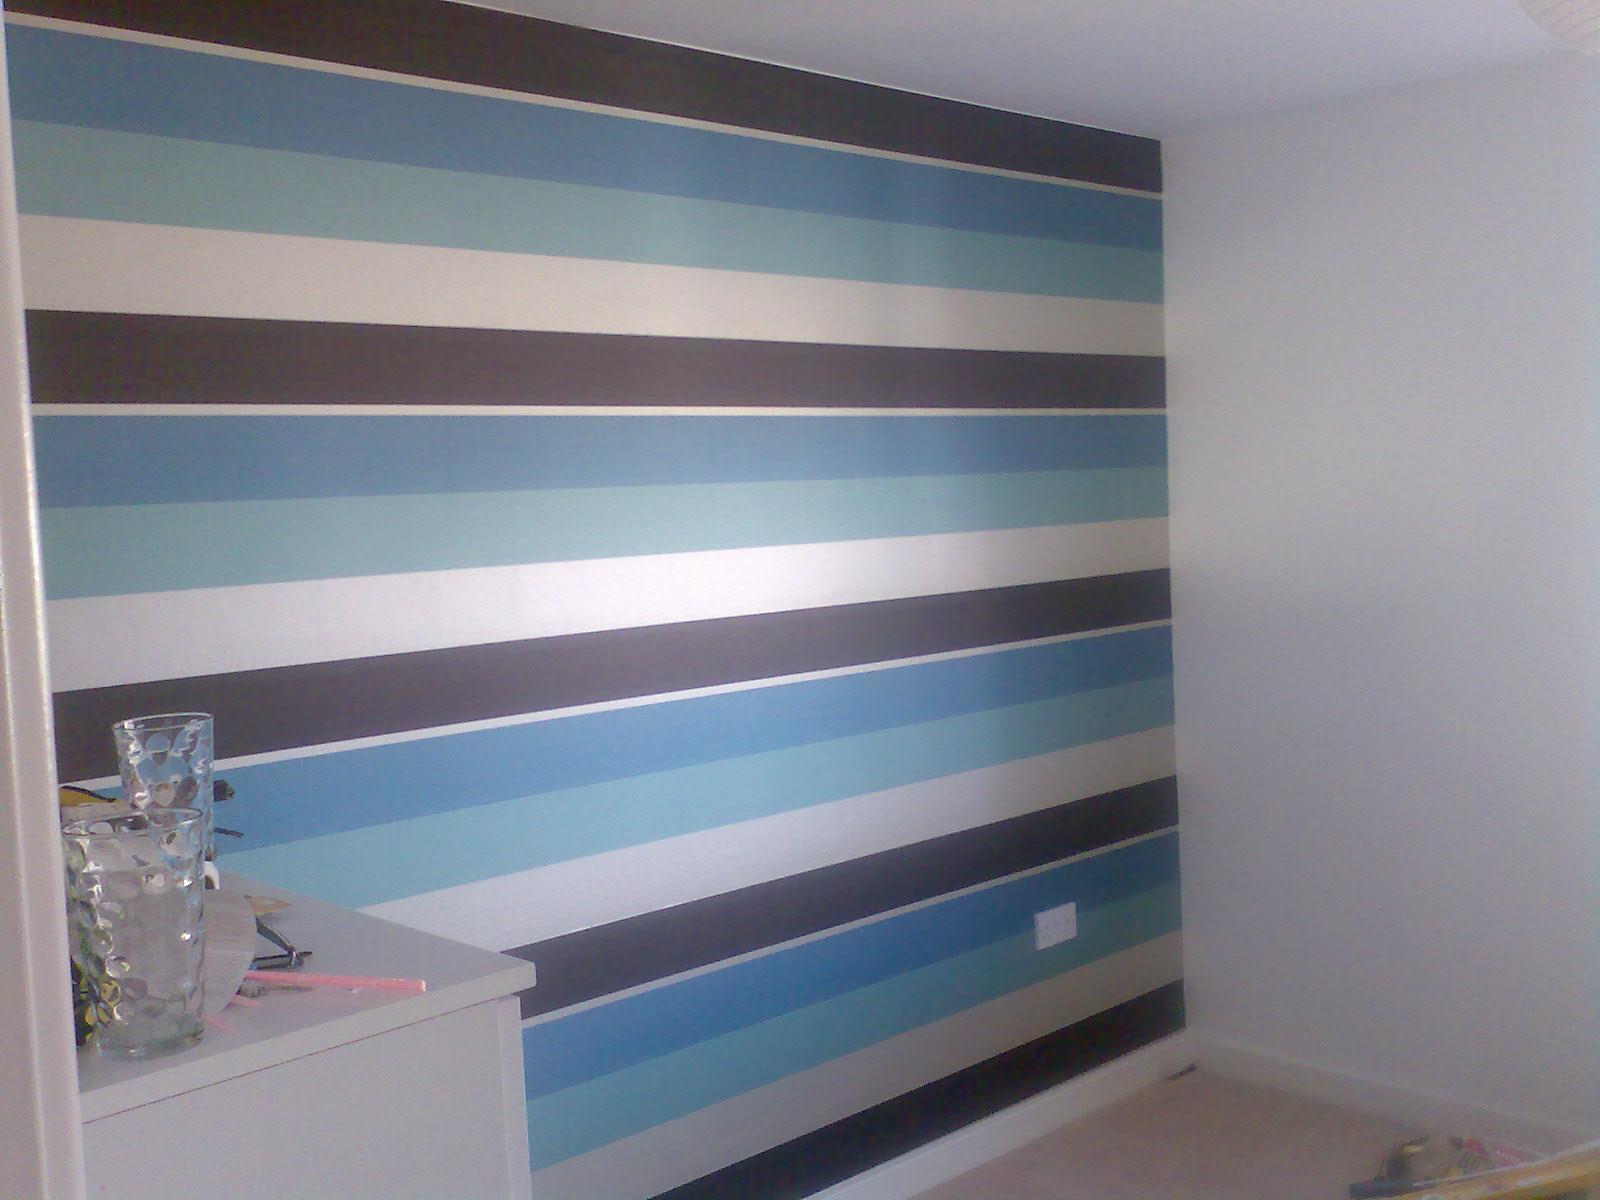 Horizontal Striped Wallpaper Borders